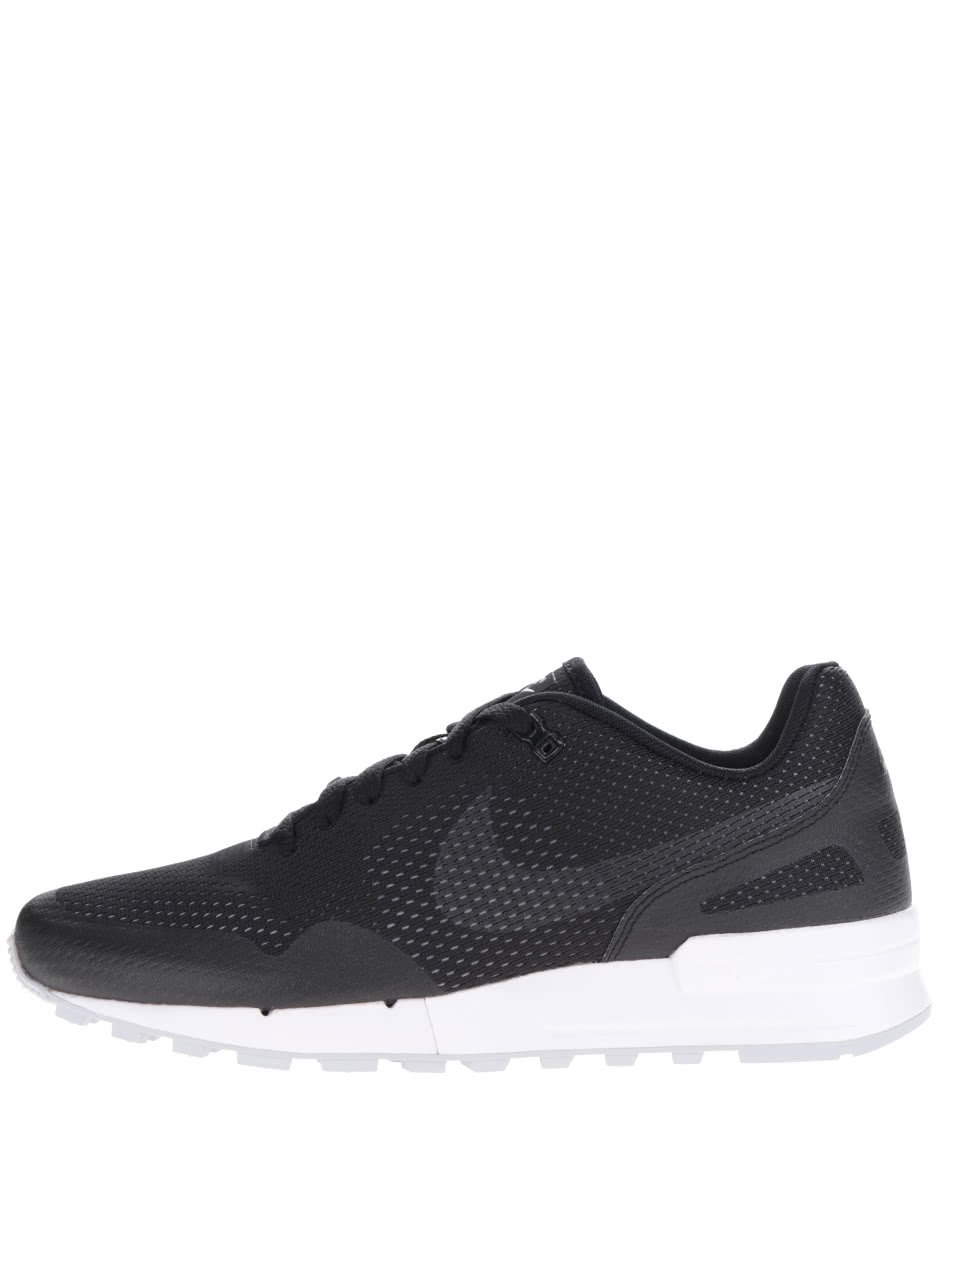 Černé pánské tenisky Nike Air Pegasus